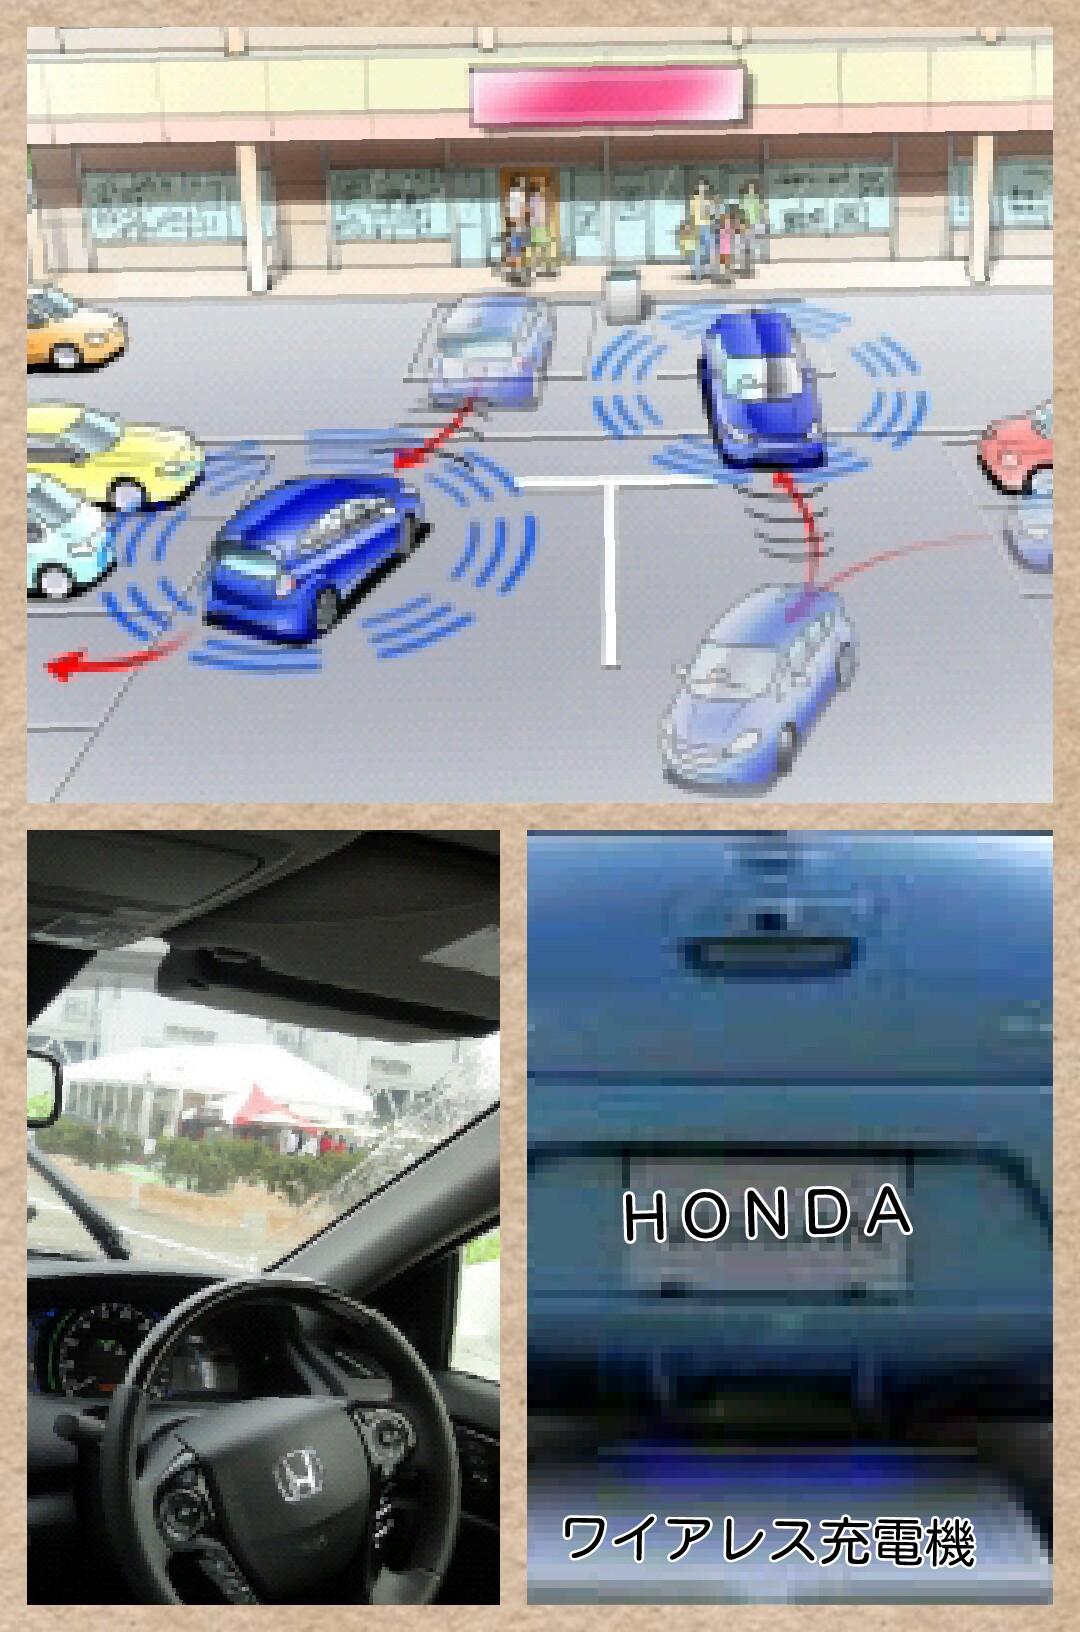 Phev ブログ テスラ開発中の「snakebot Autocharger スネークボット オートチャージャー 」が怖い